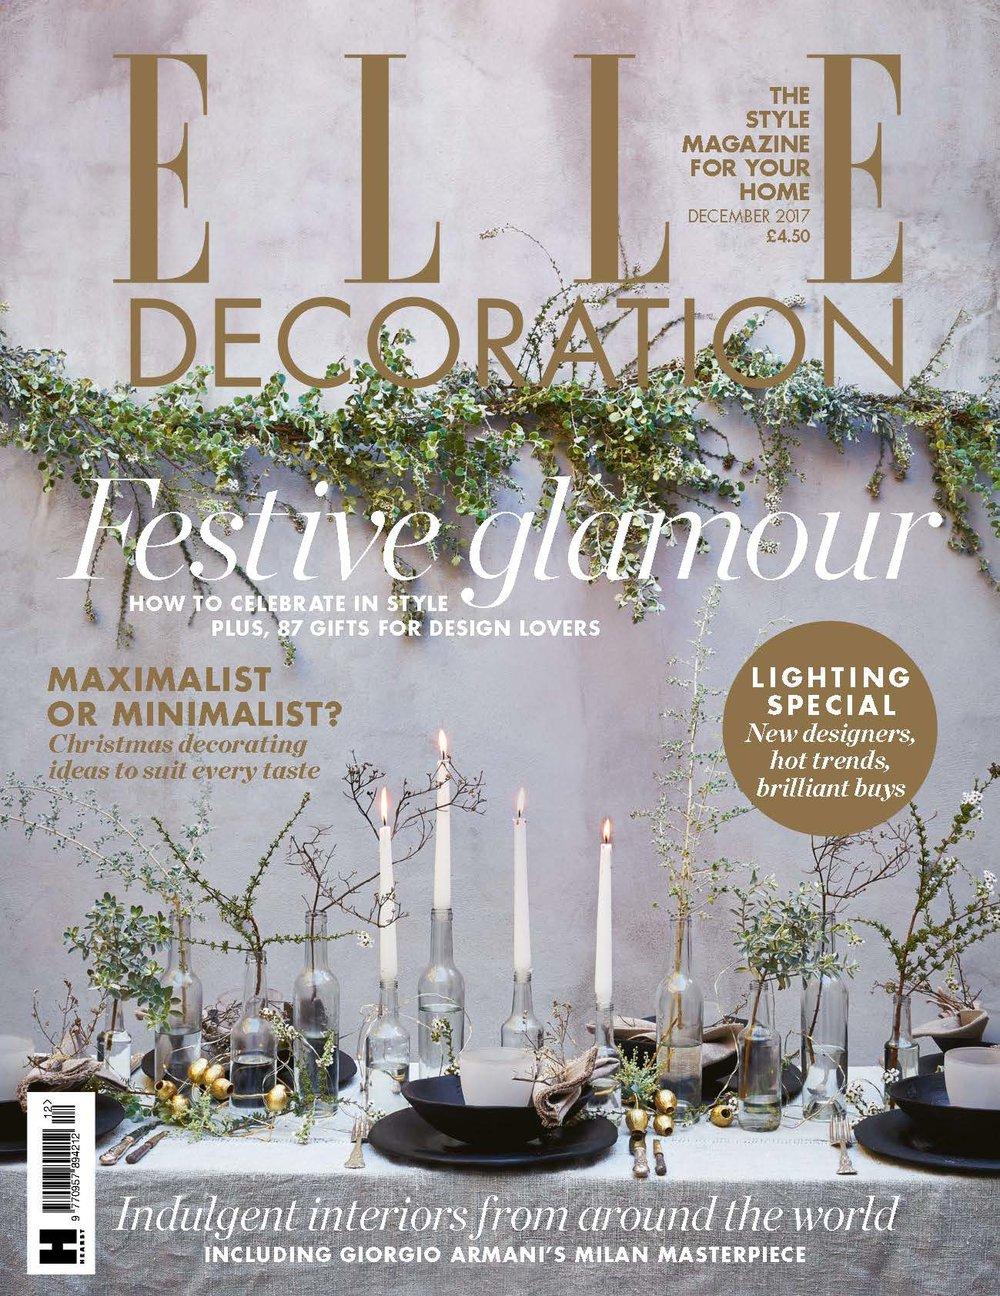 Elle Decor UK, December 2017